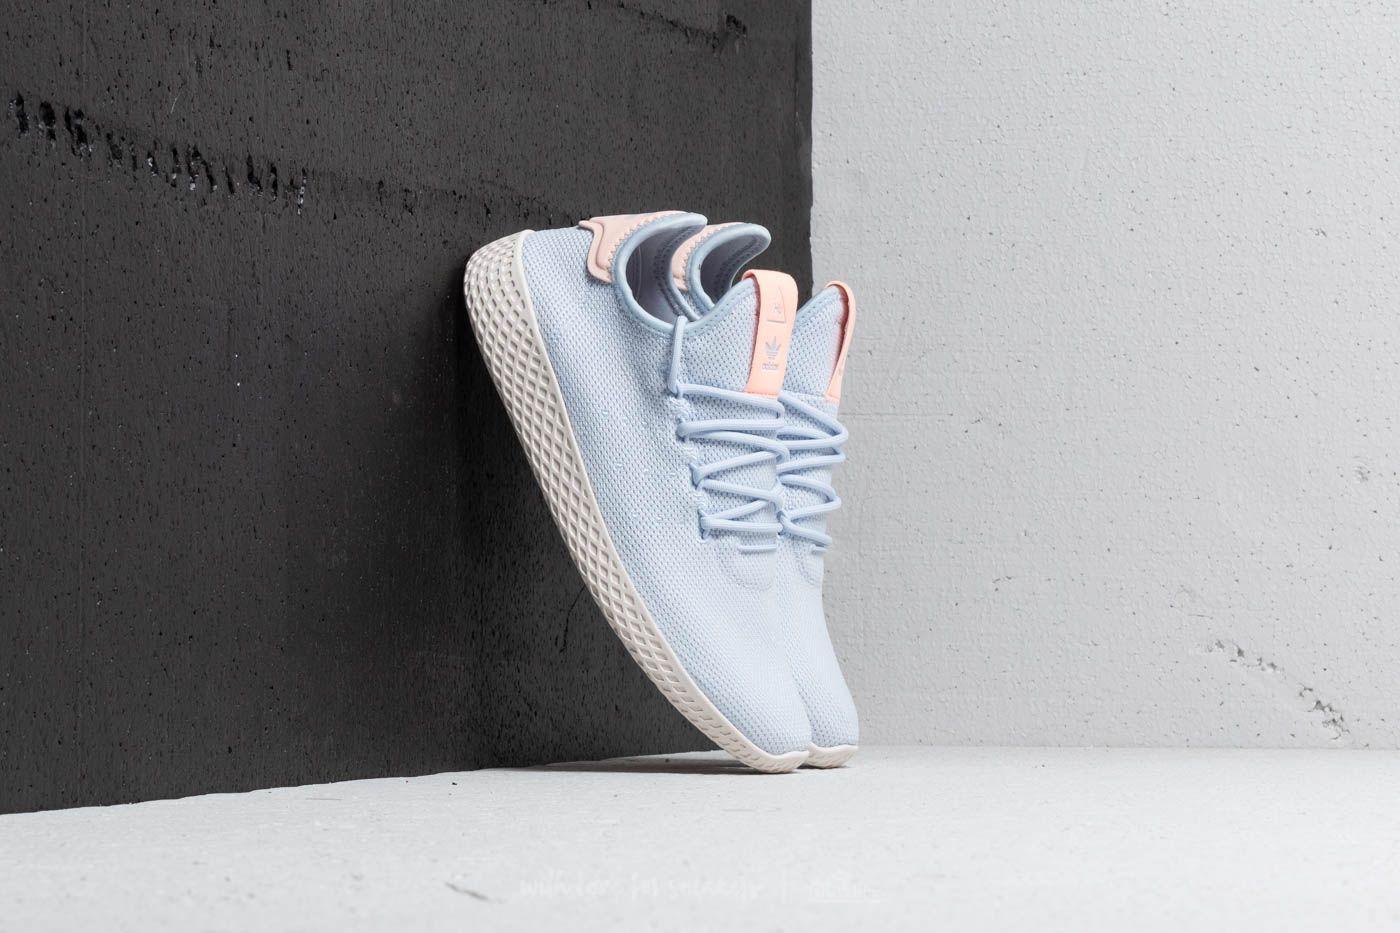 dc4740d540d84 adidas Pharrell Williams Tennis HU W Aero Blue  Aero Blue  Chalk ...